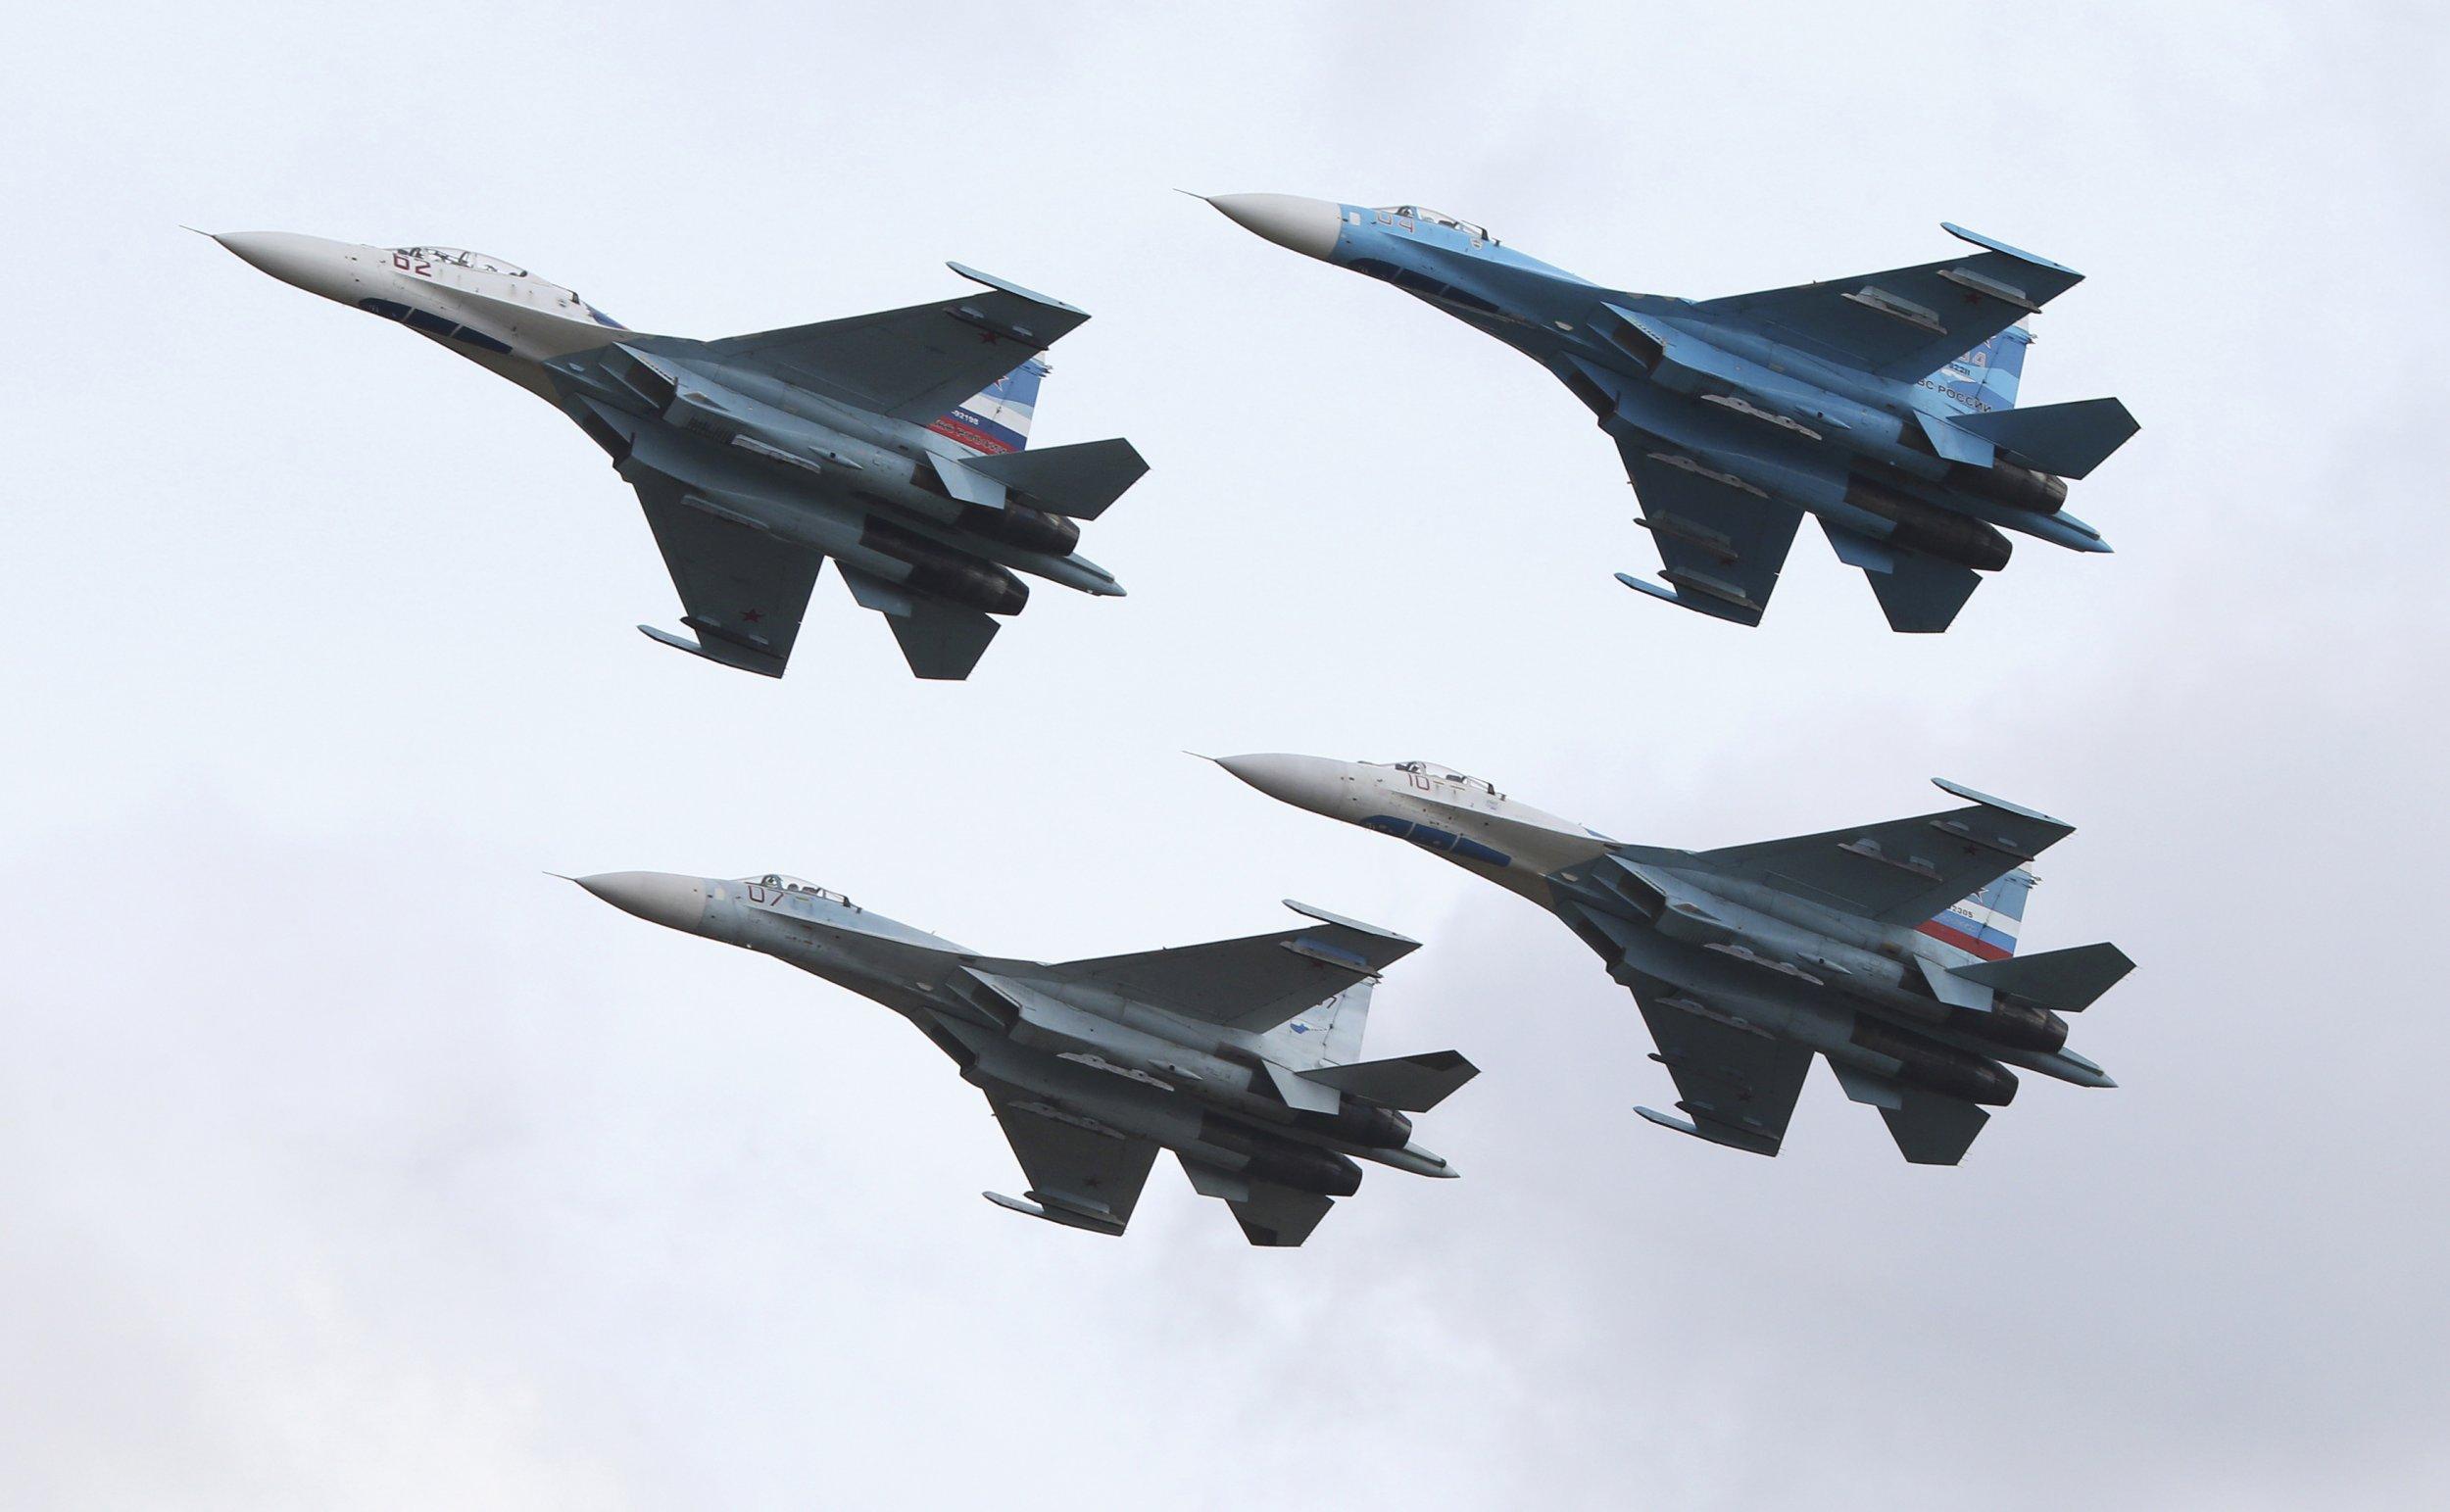 NATO Intercepts Russian Bombers Above Baltic Sea Twice in One Week